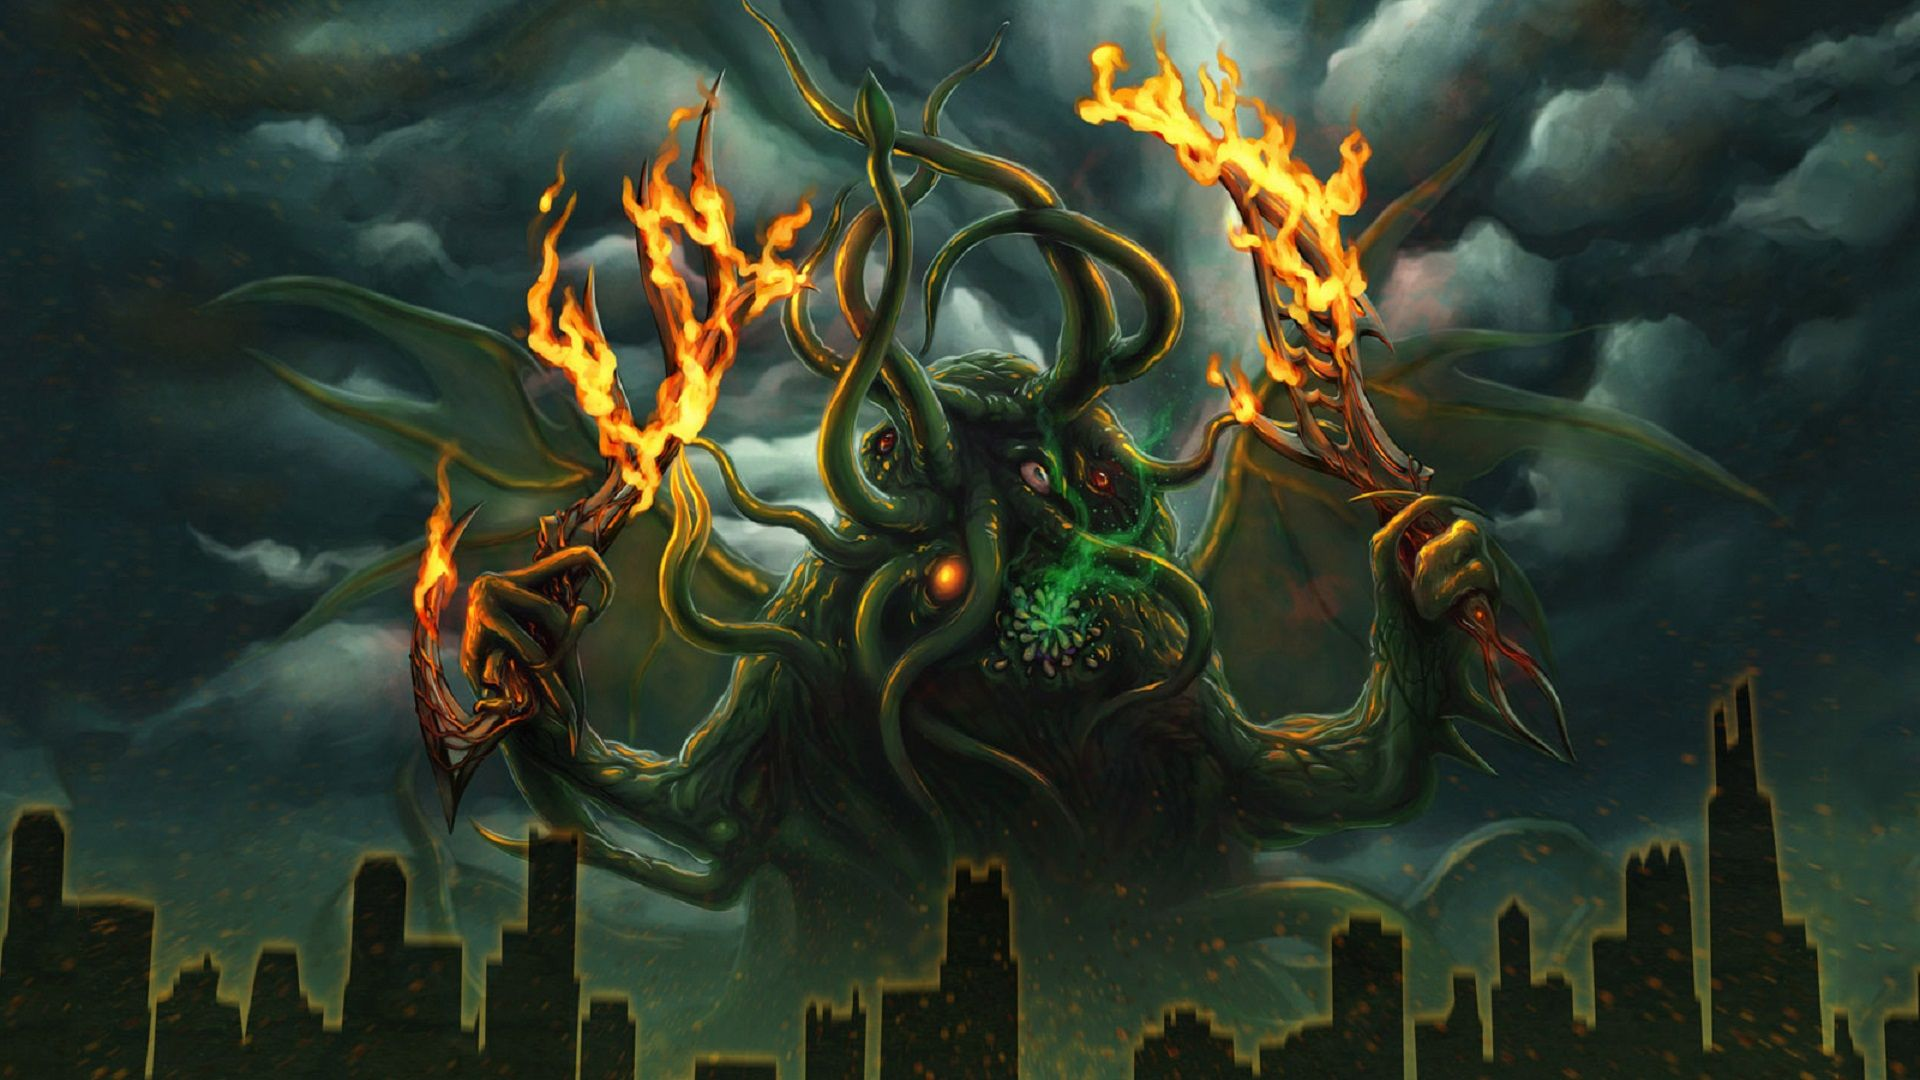 Cthulhu Hd Wallpaper Cthulhu Monster Art Cthulhu Mythos